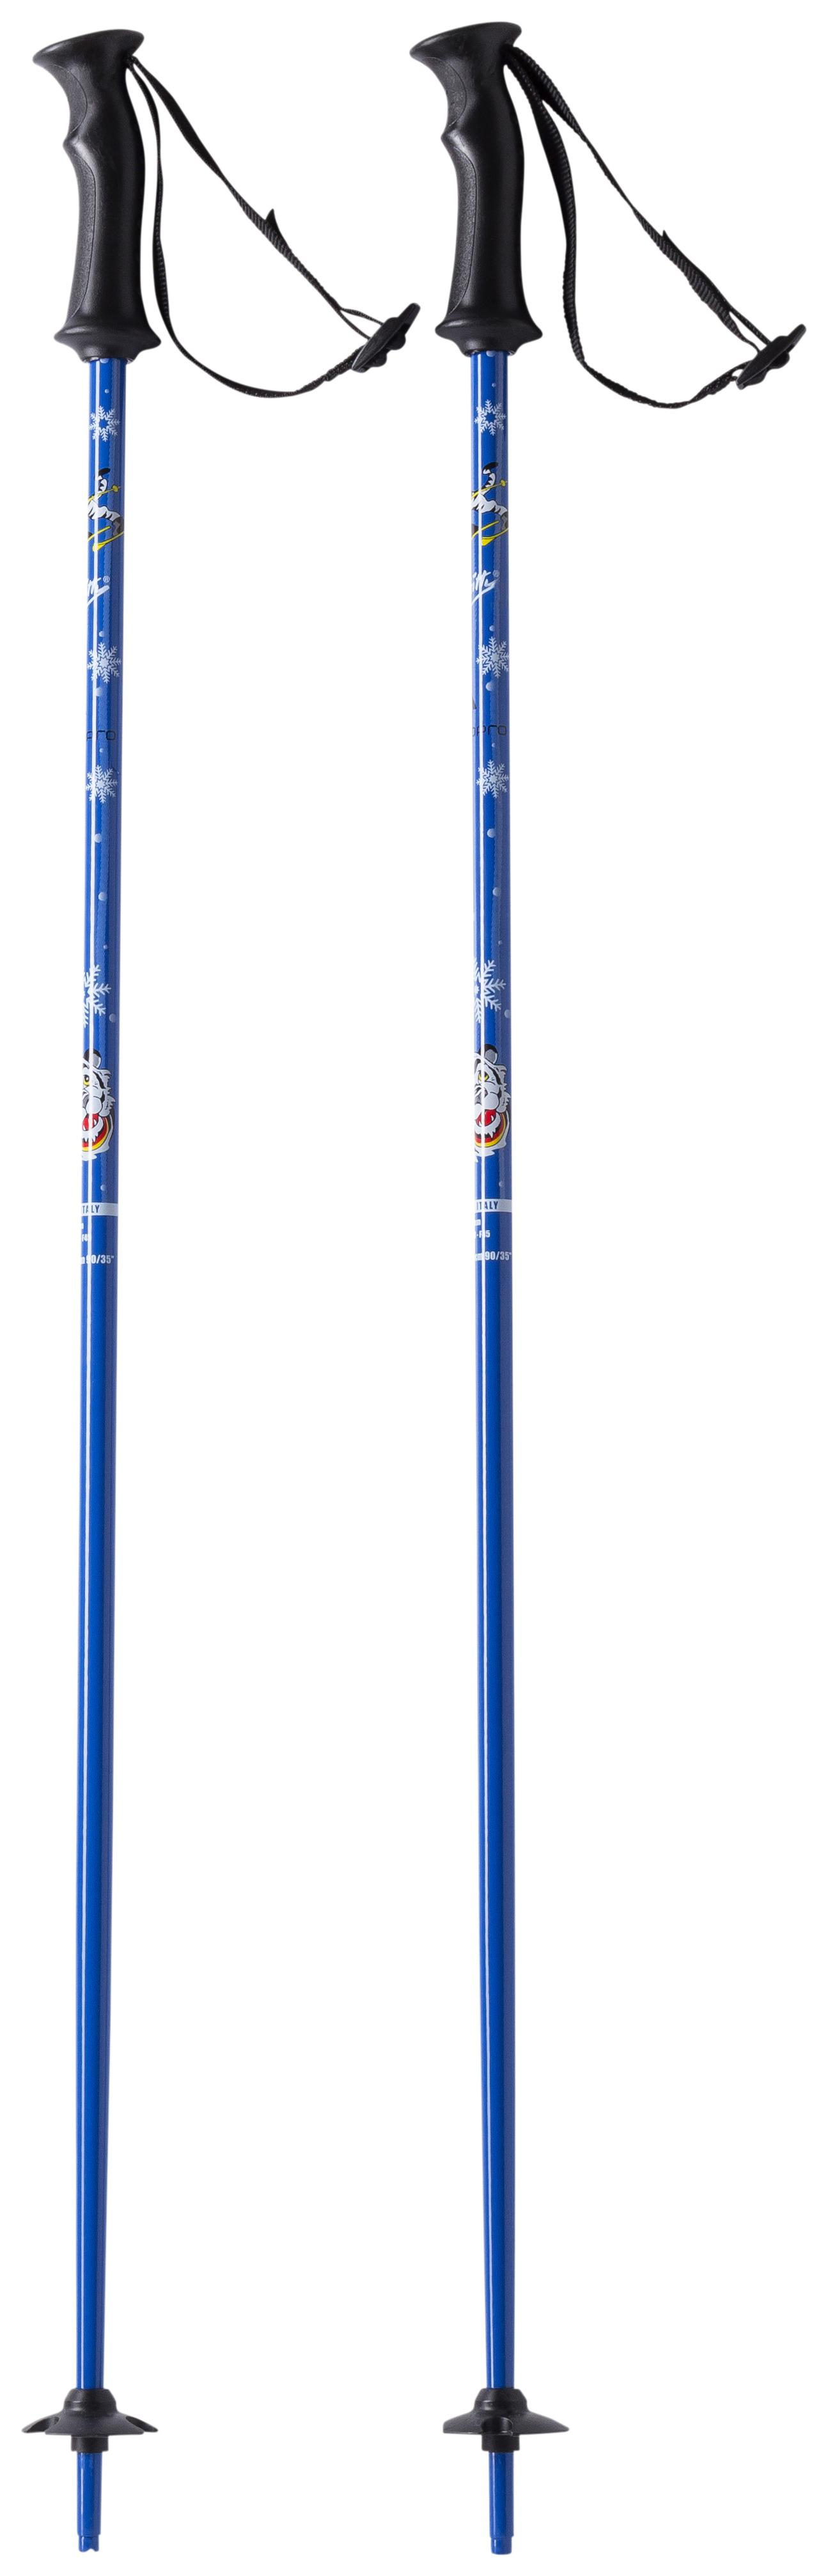 Kinder Skistöcke Skitty, BLAU, 85